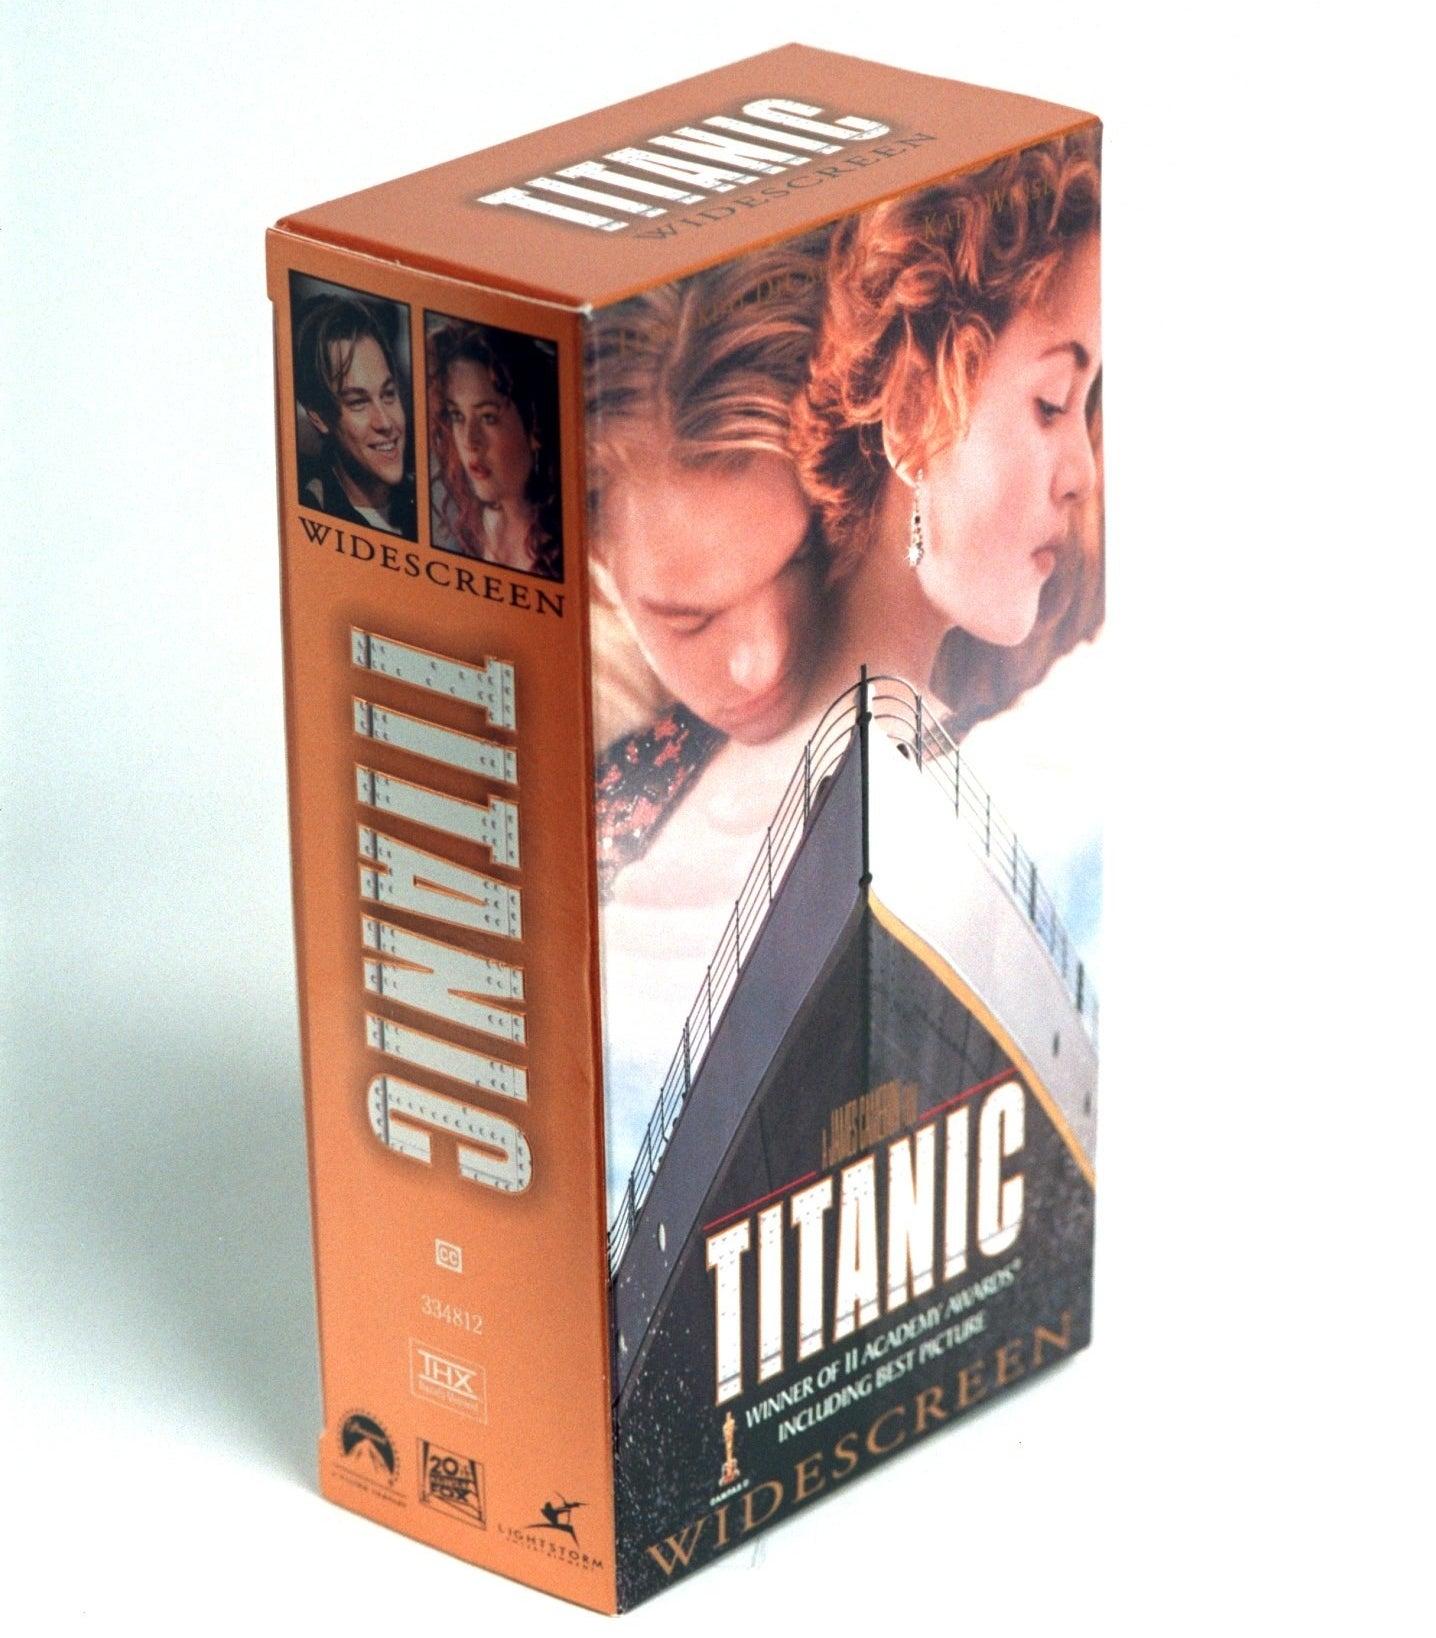 A VHS copy of Titanic